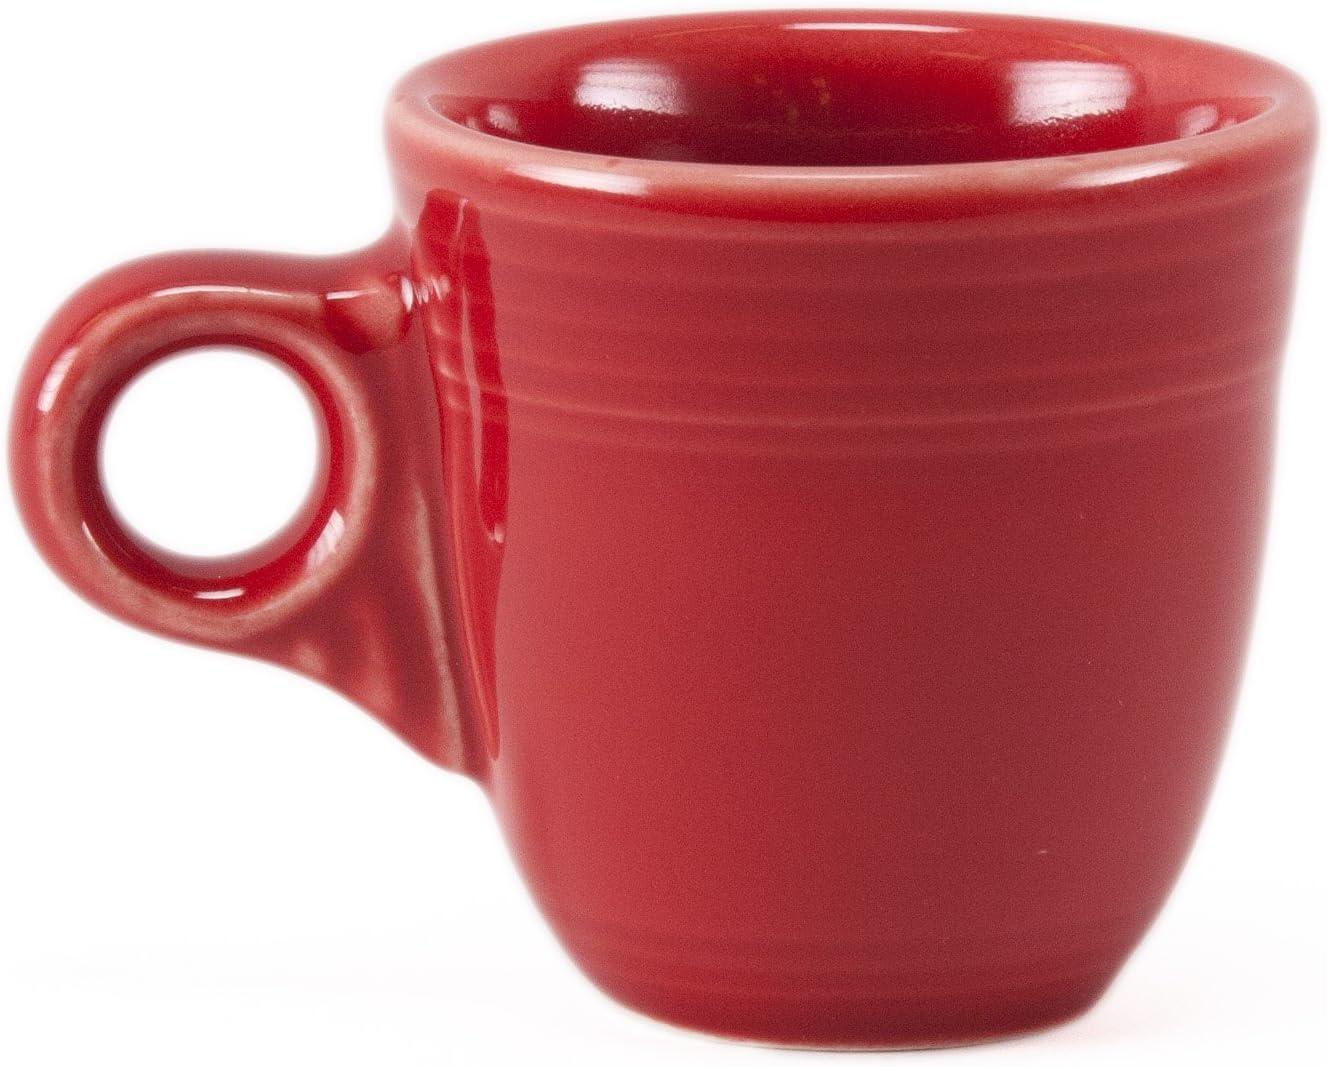 Set 4 Black Homer Laughlin Demitasse//Espresso Cups and Saucers,Lead Free